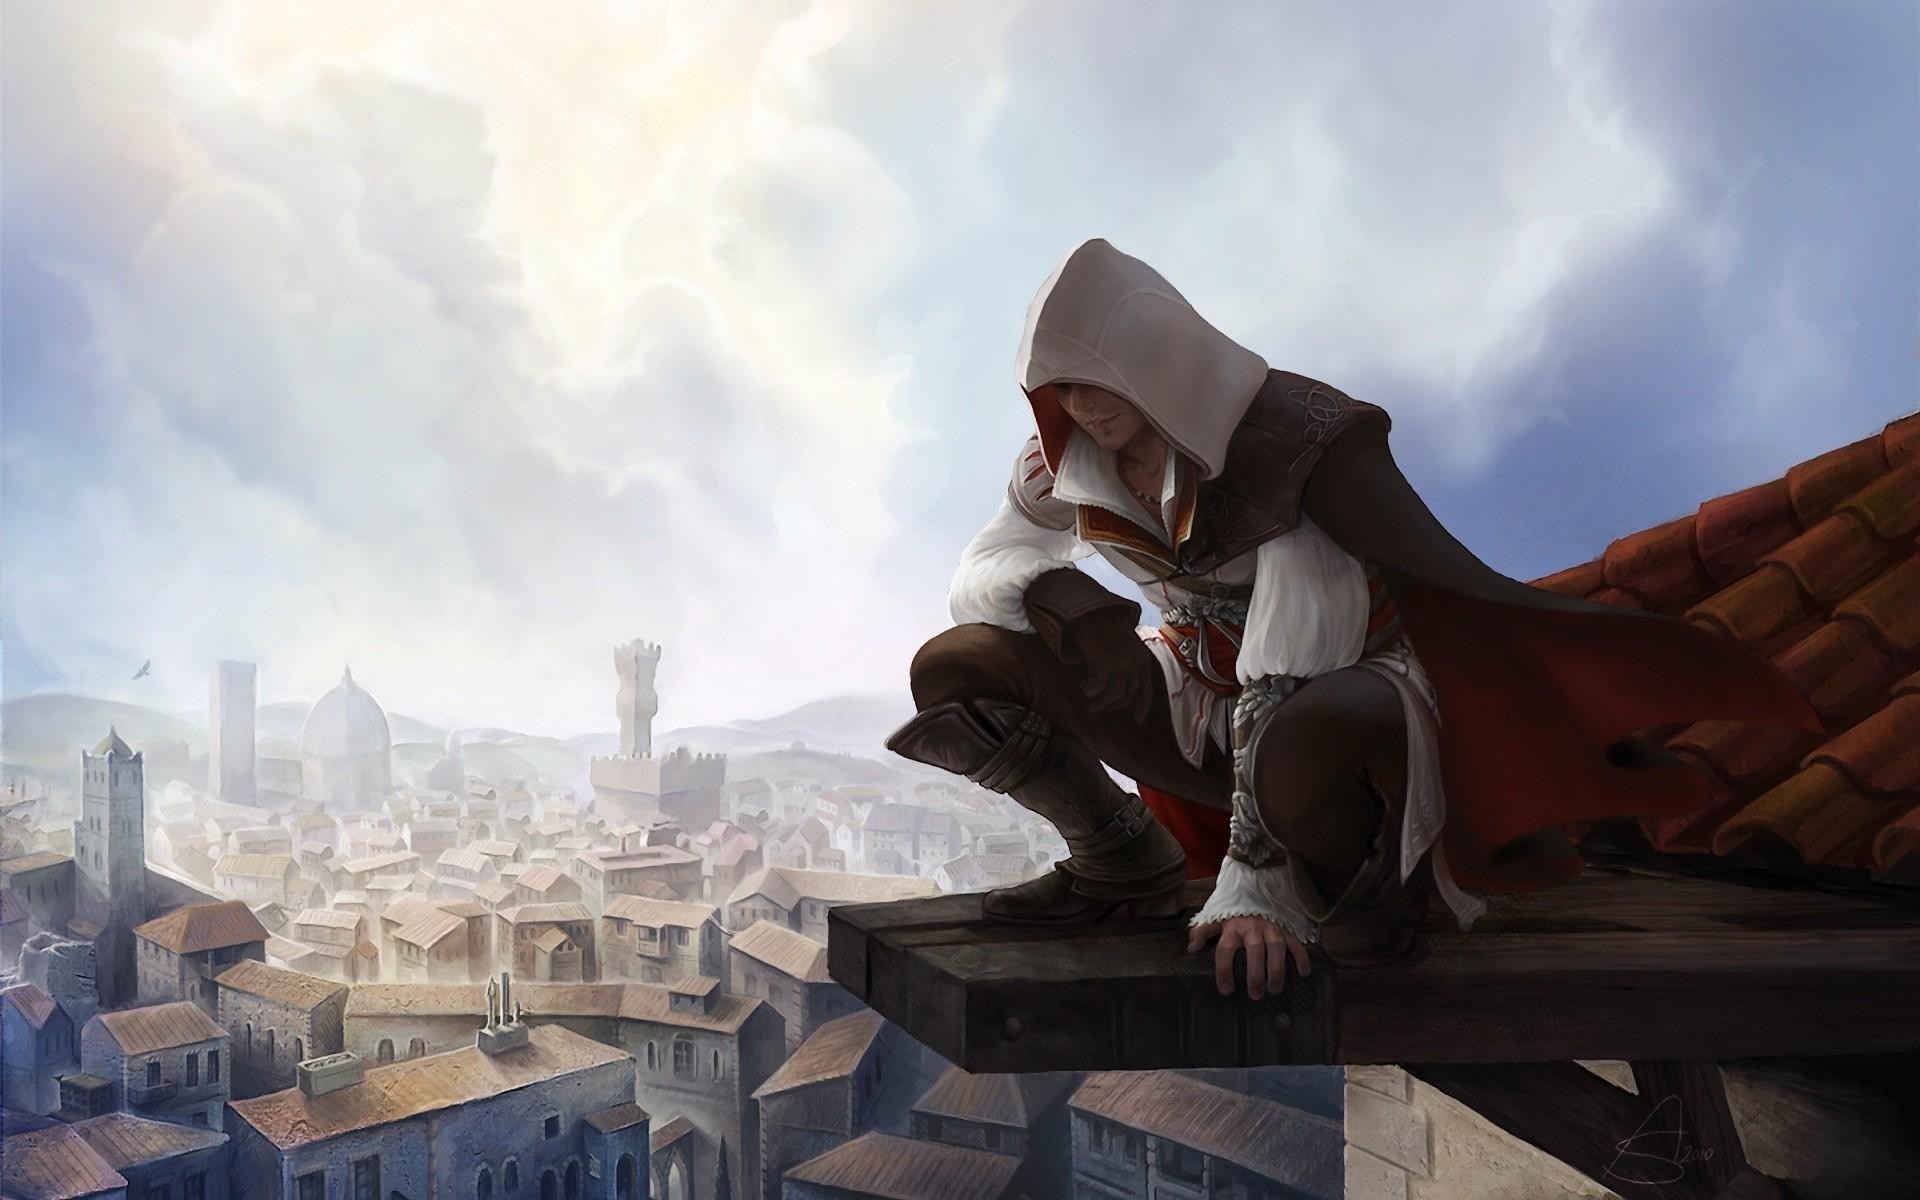 Assassins Creed Ii In Ezio Wallpapers 1920x1200 288321